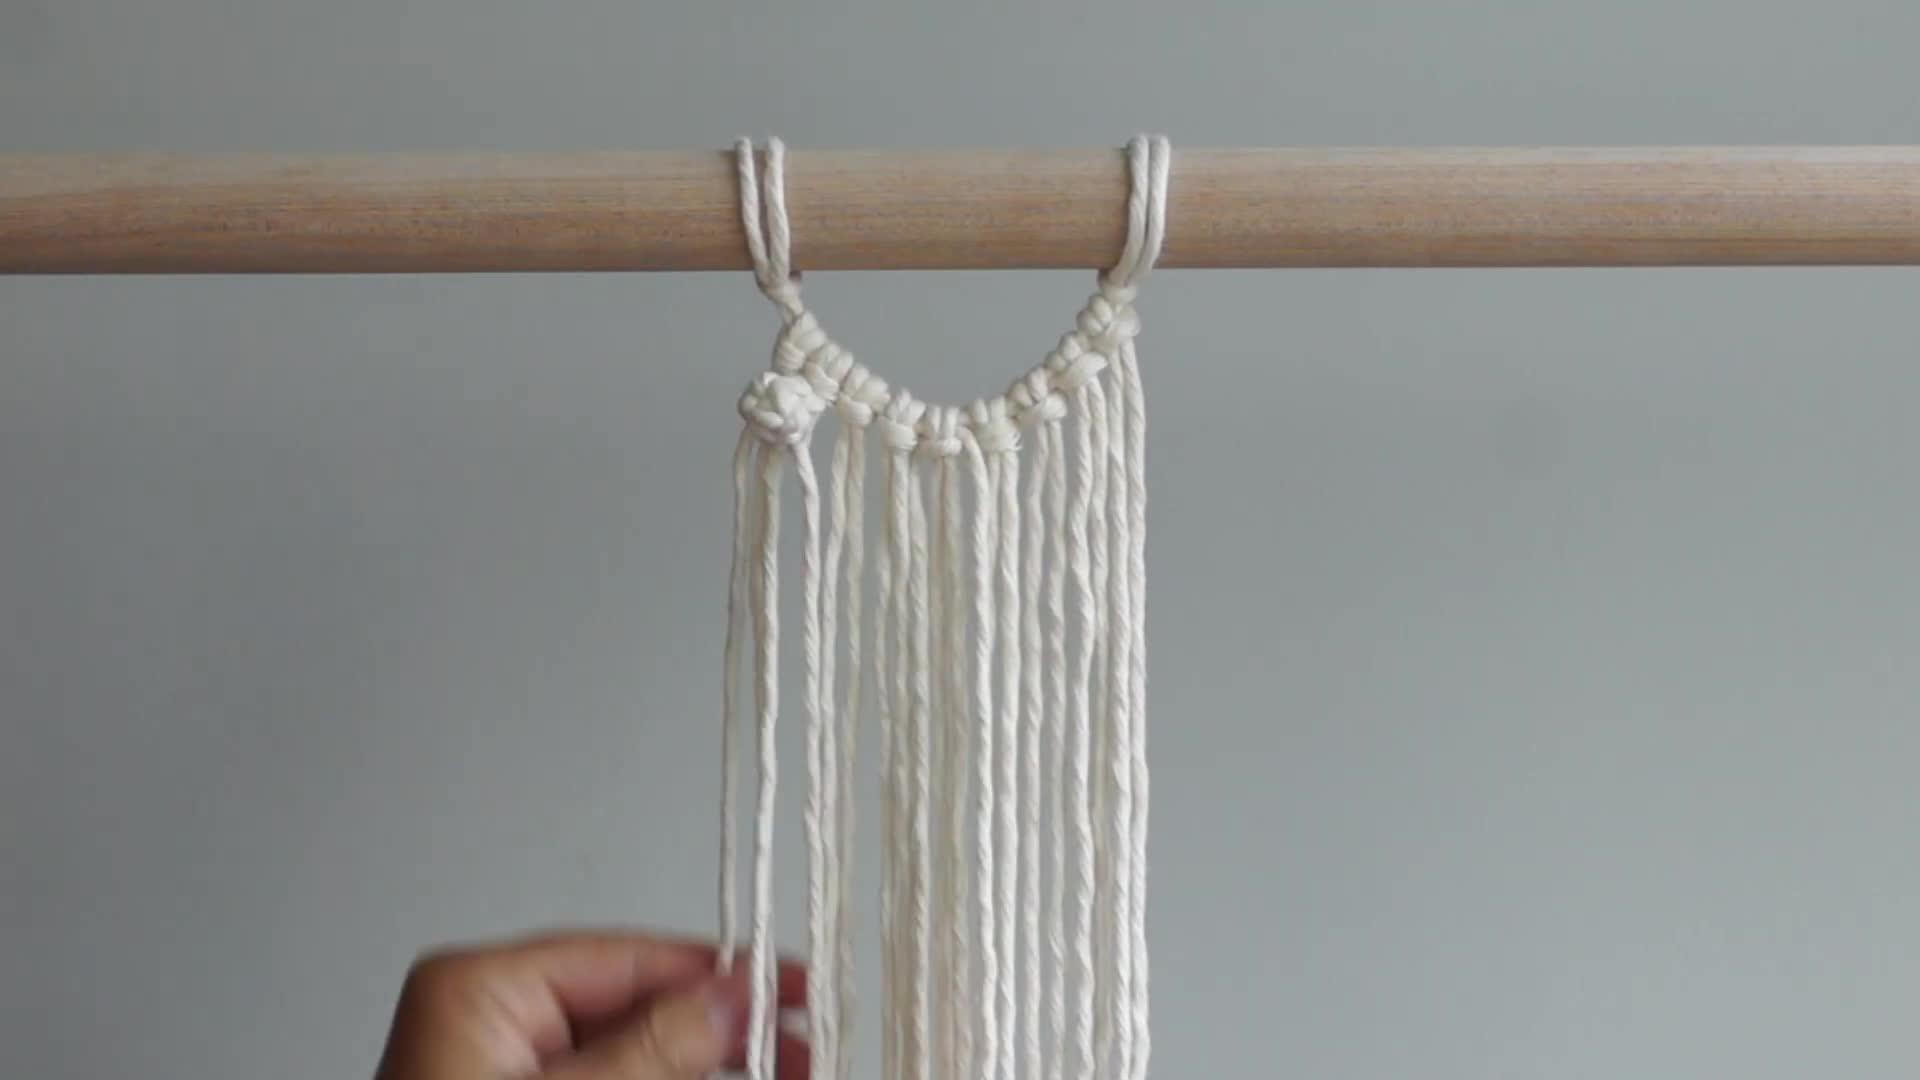 DIY Macrame绳编基础教程:半圆浆果结(Berry Knots)的结绳方法